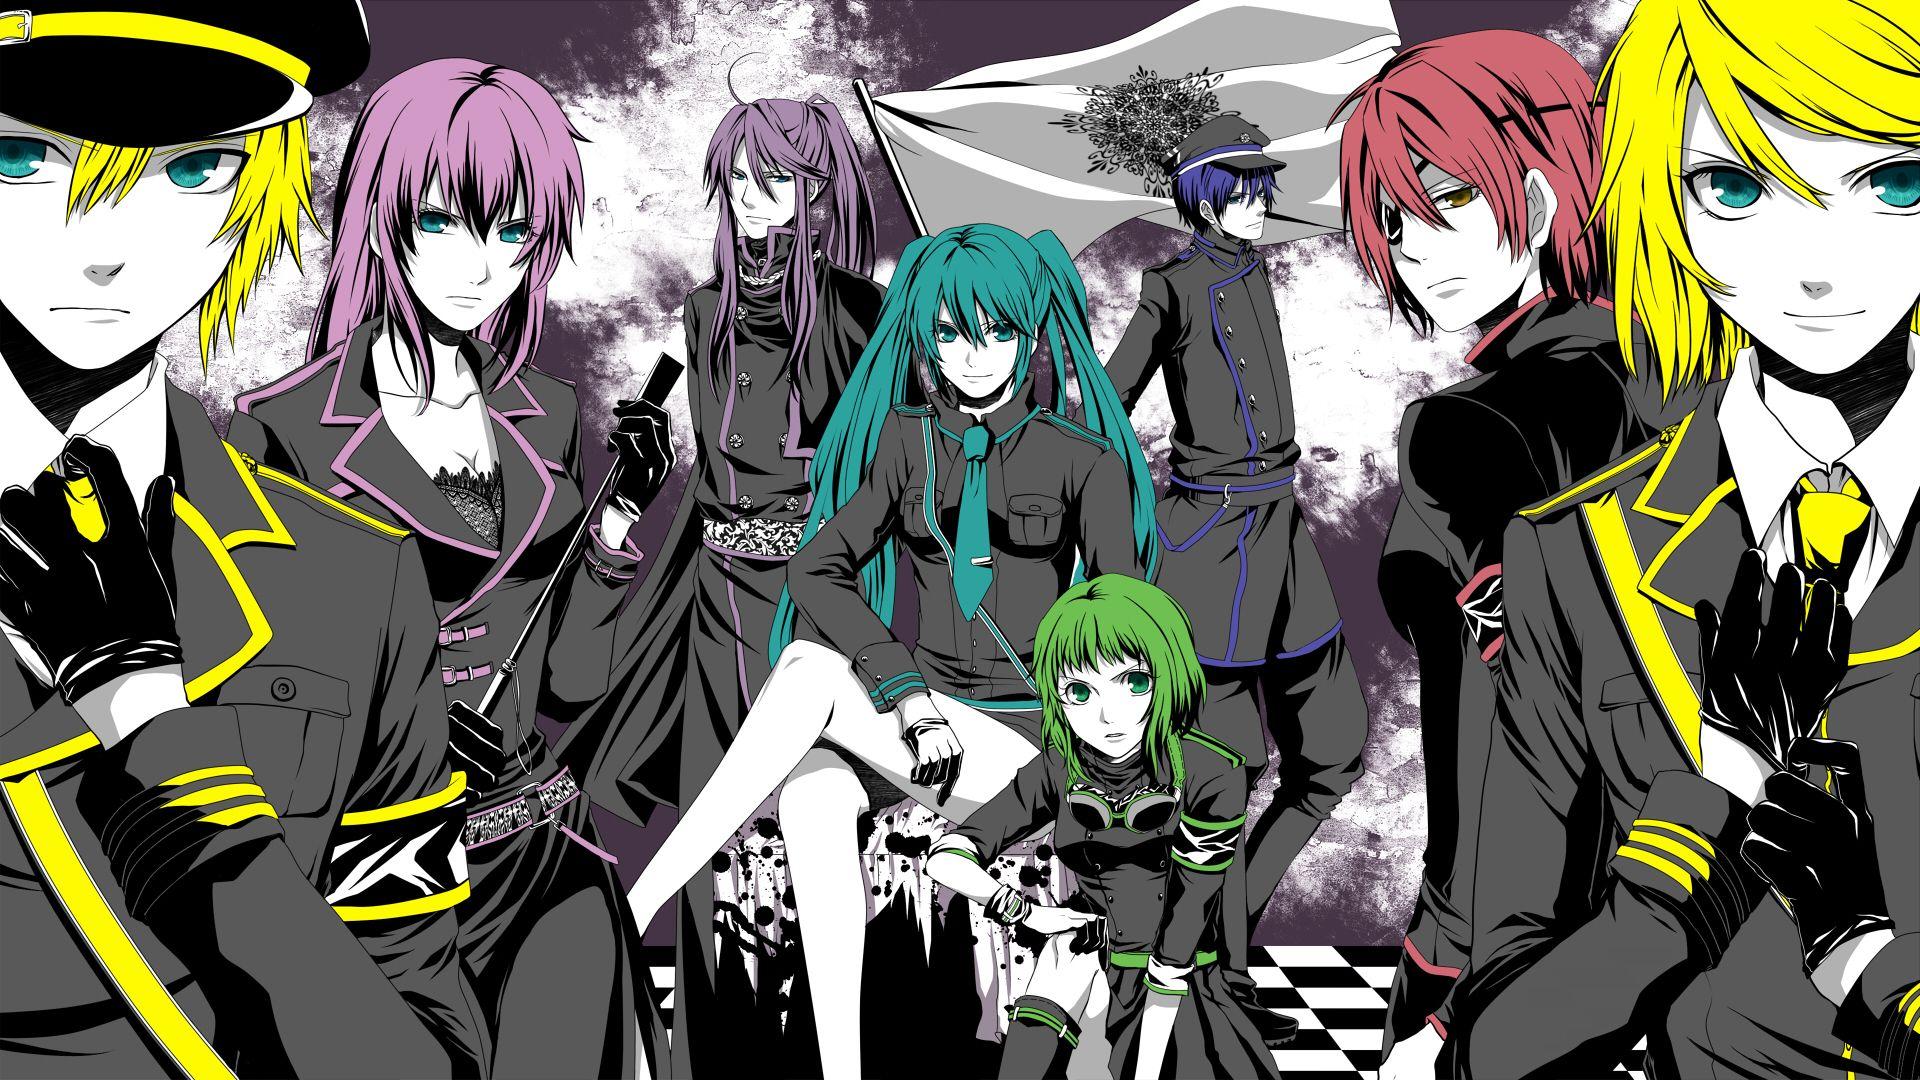 Anime Vocaloid Wallpaper